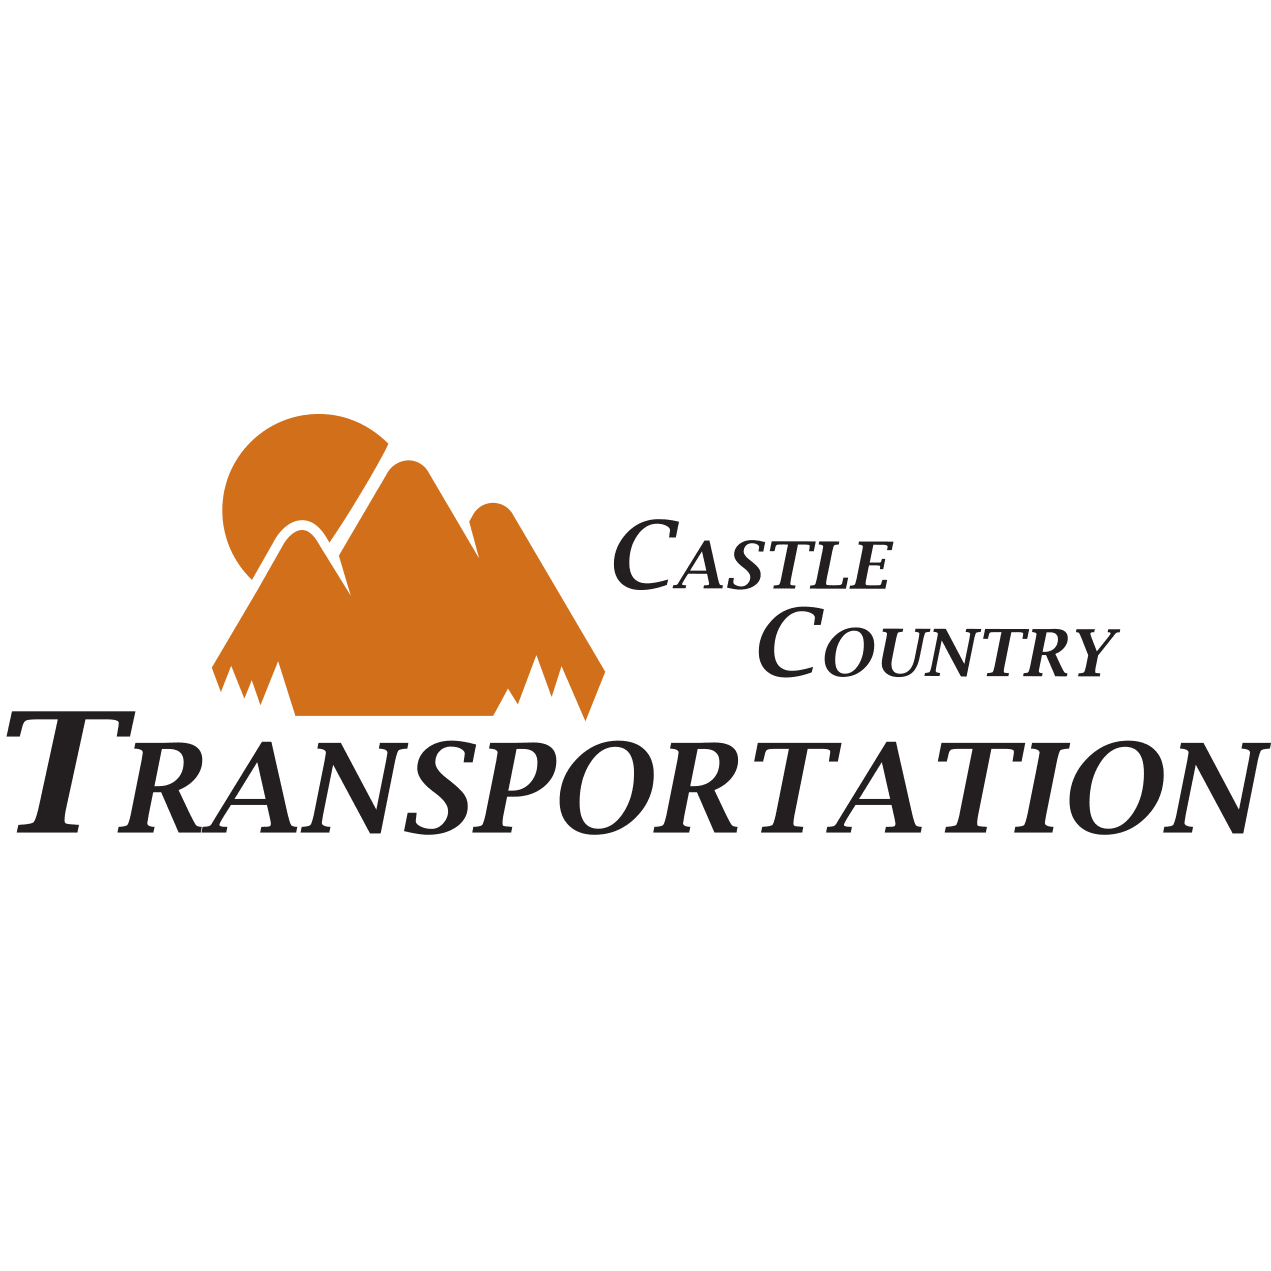 Castle Country Transportation